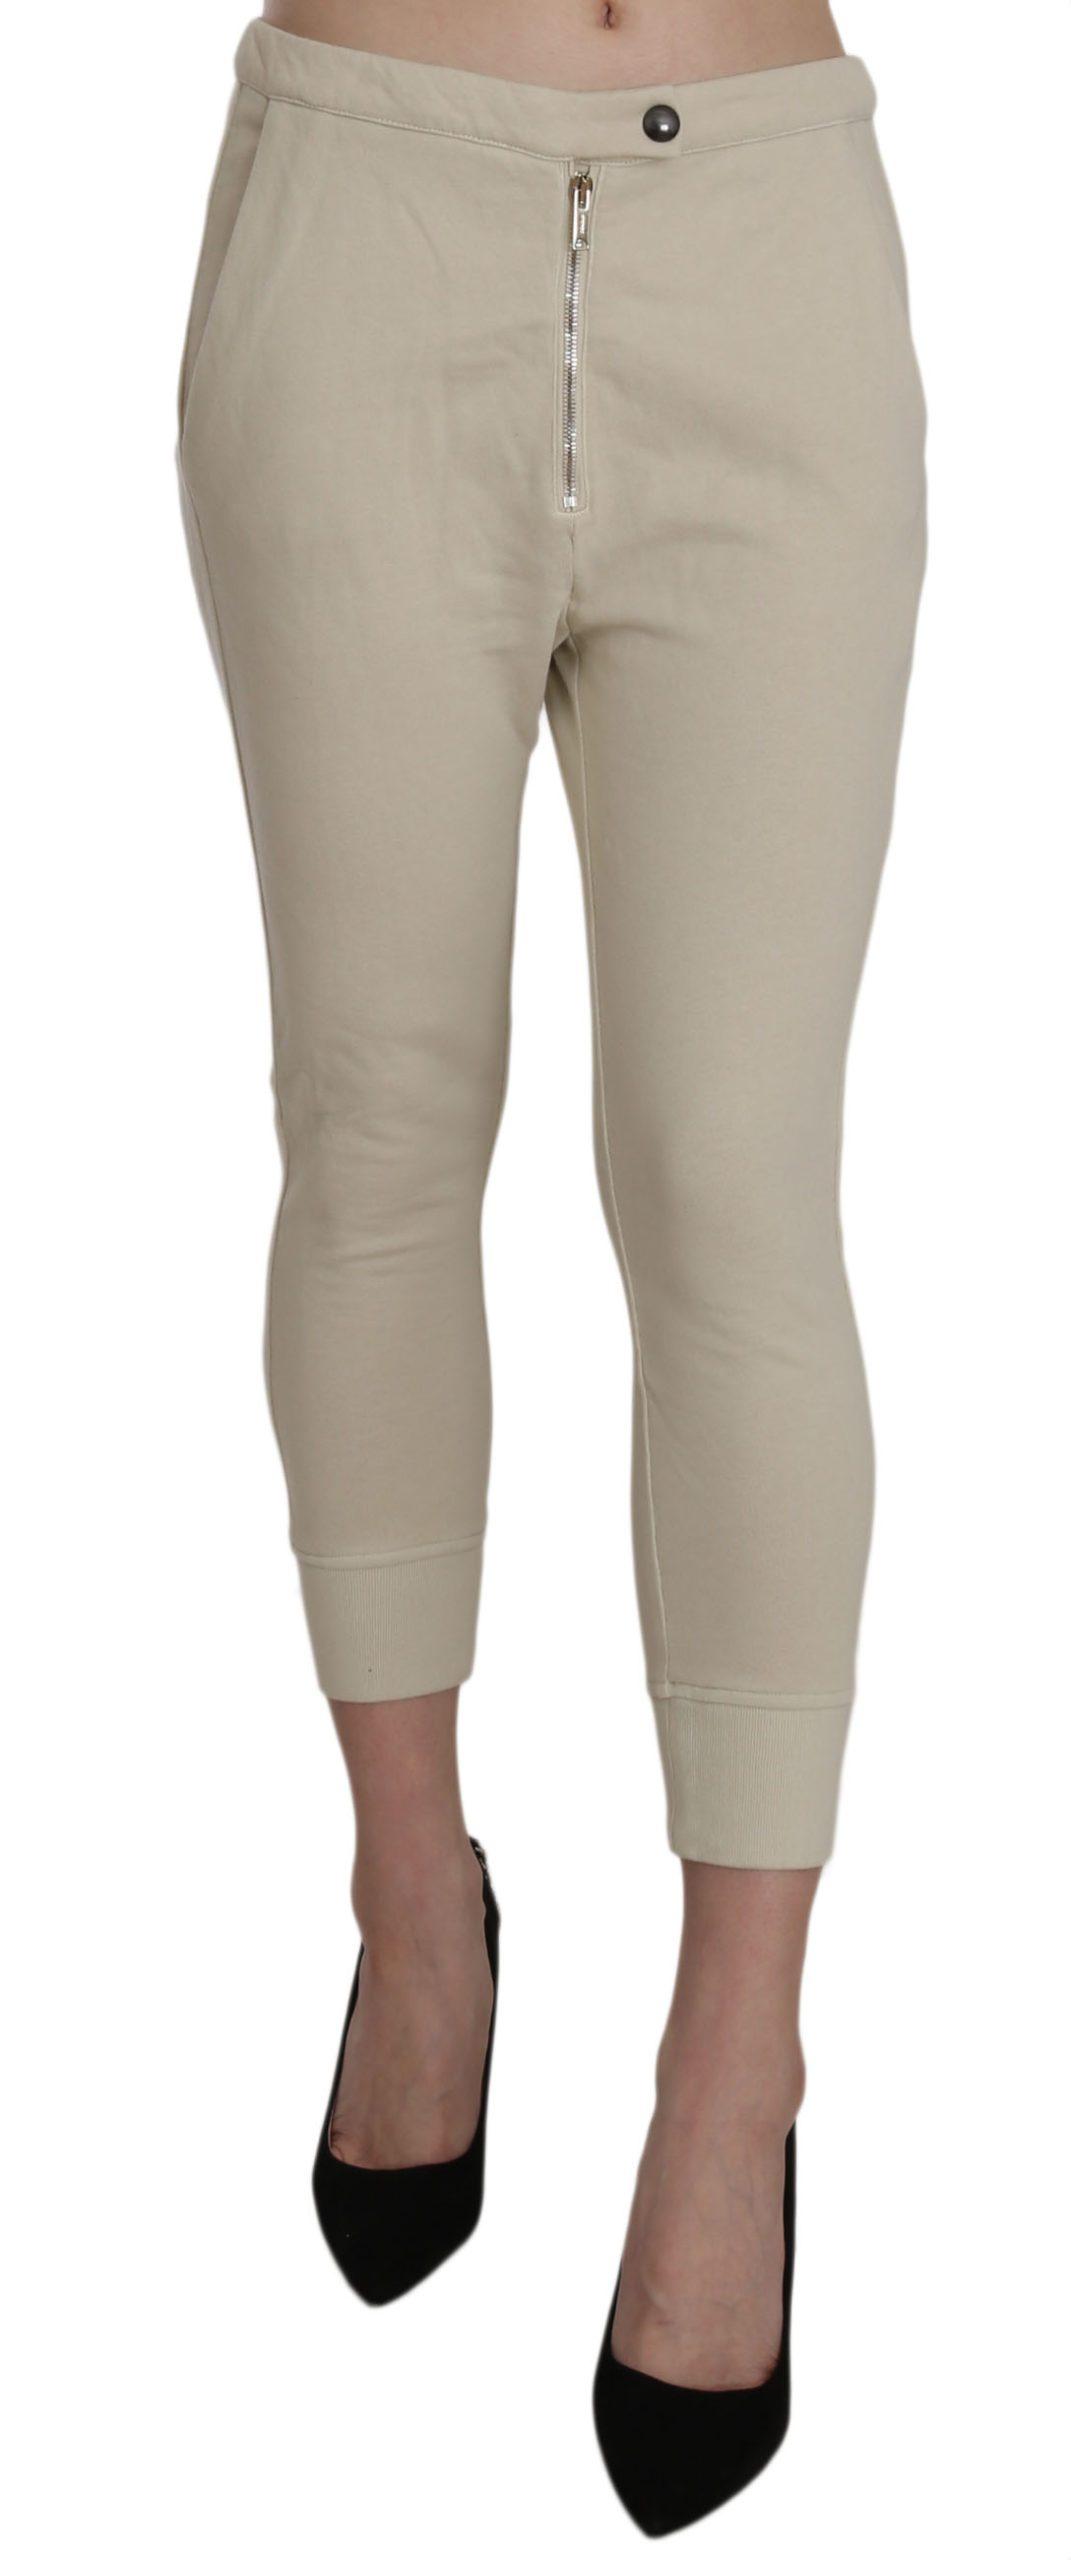 Dondup Women's Mid Waist Cotton Skinny Cropped Trouser Beige PAN70212 - IT40|S